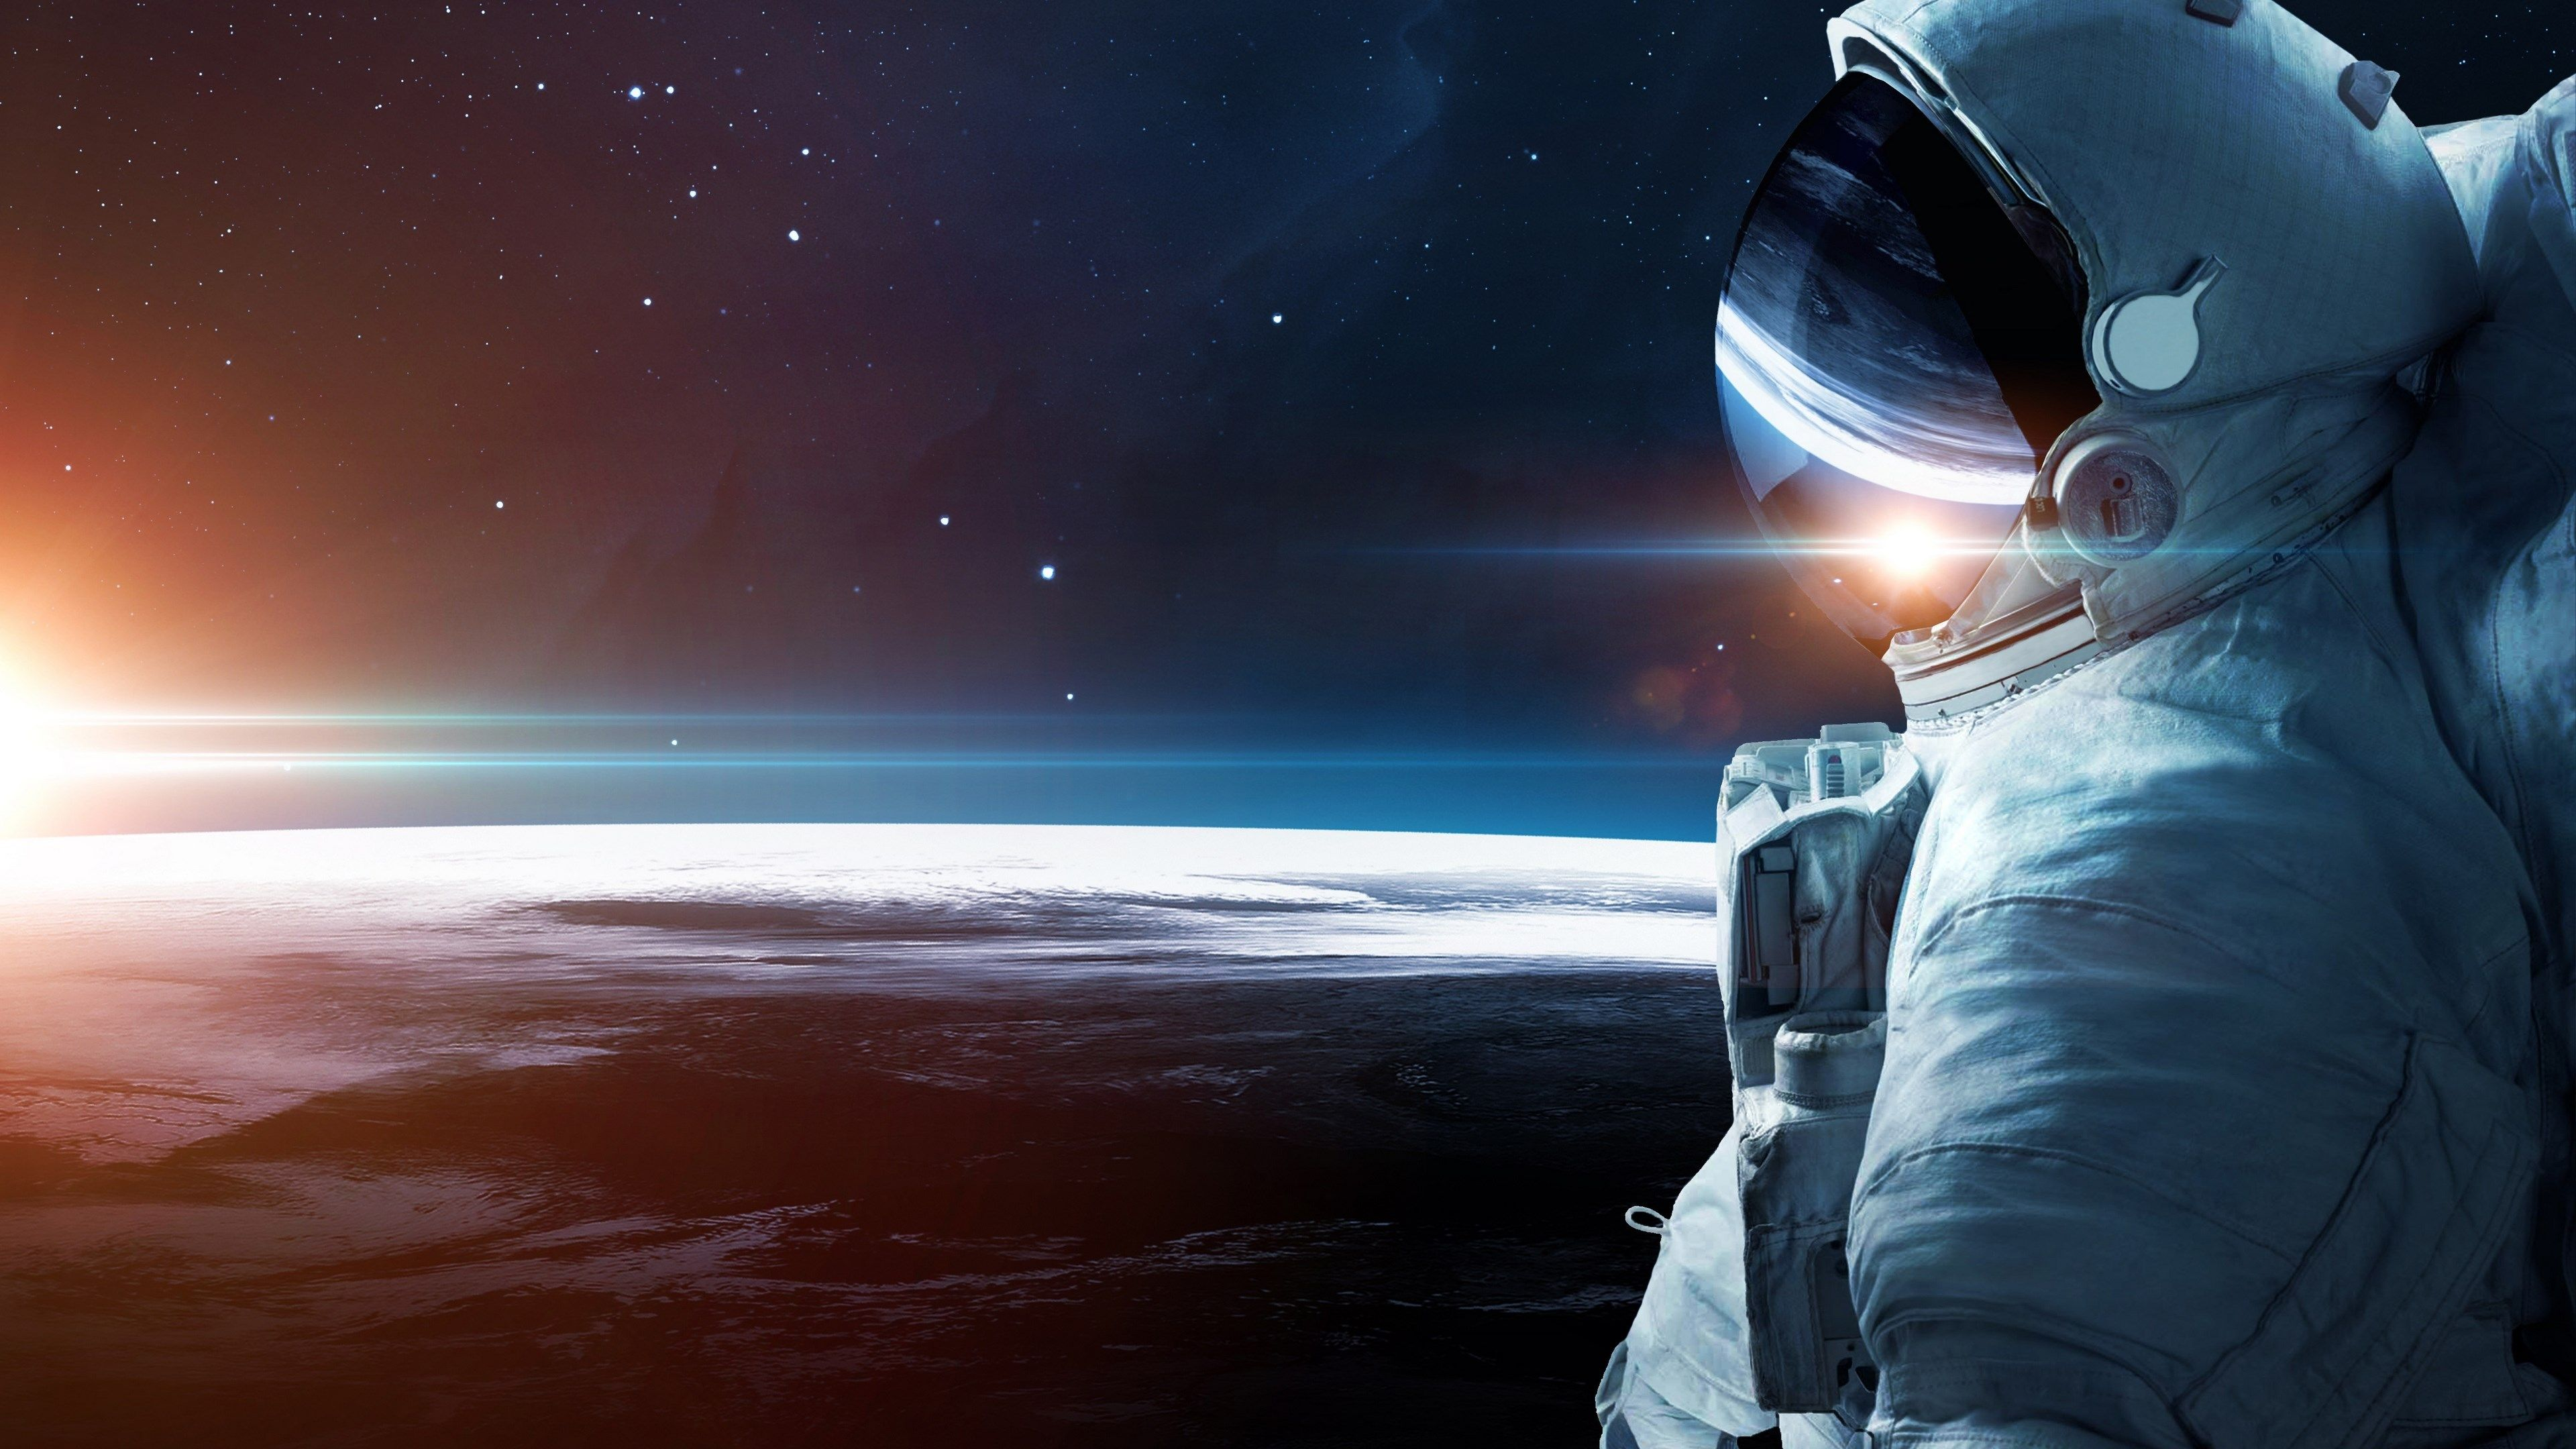 4k Desktop Wallpaper 3840x2160 Hd Space Sci Fi Wallpaper Astronaut Wallpaper